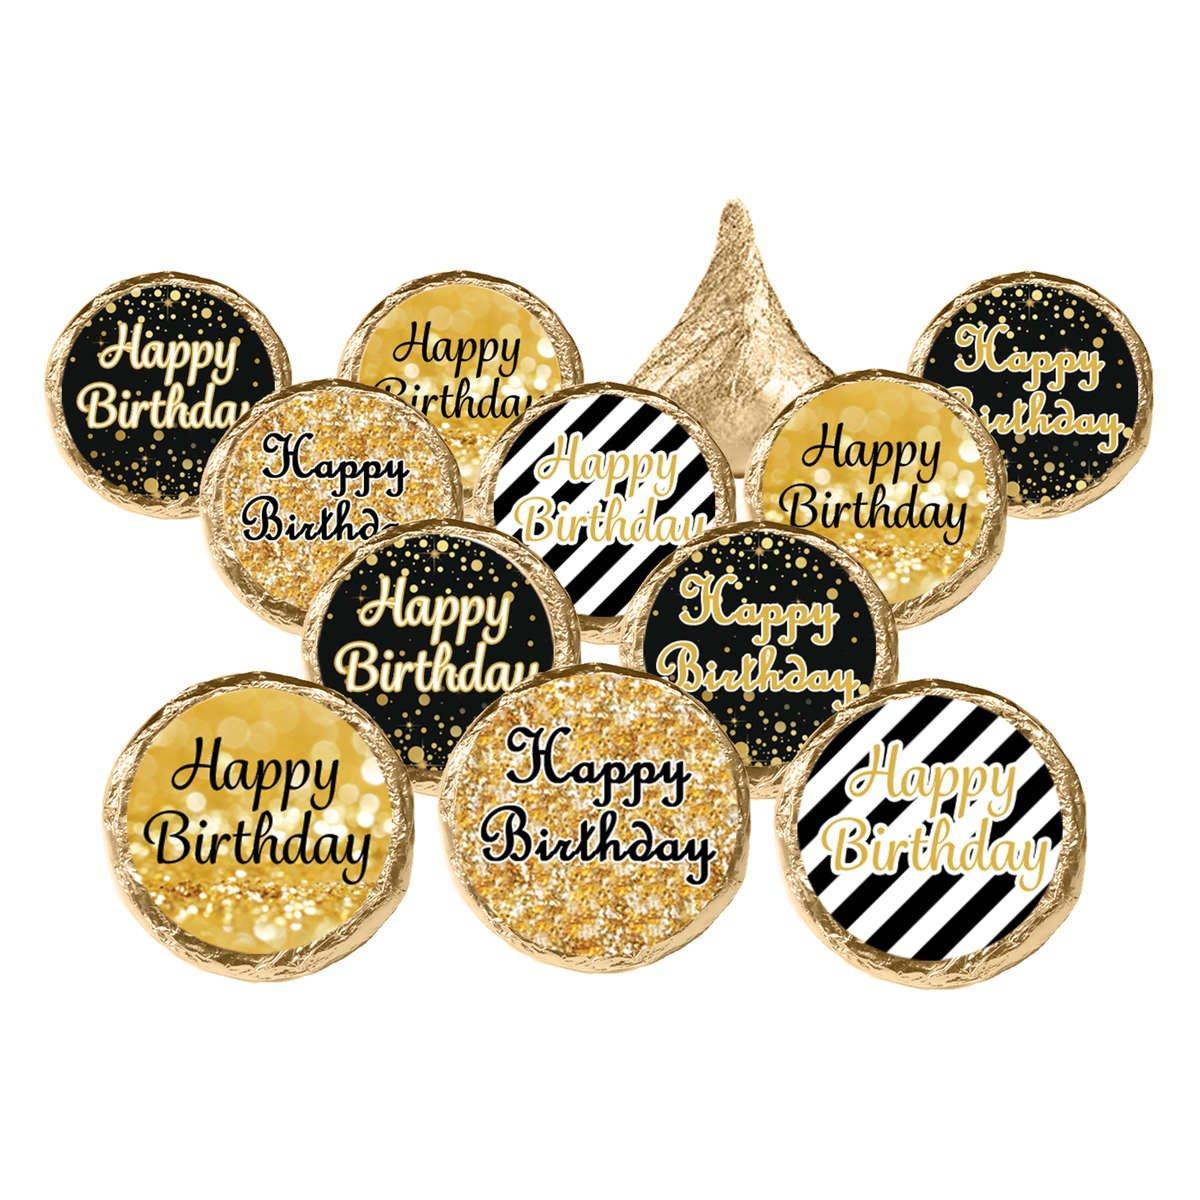 Happy Birthday Black and Gold